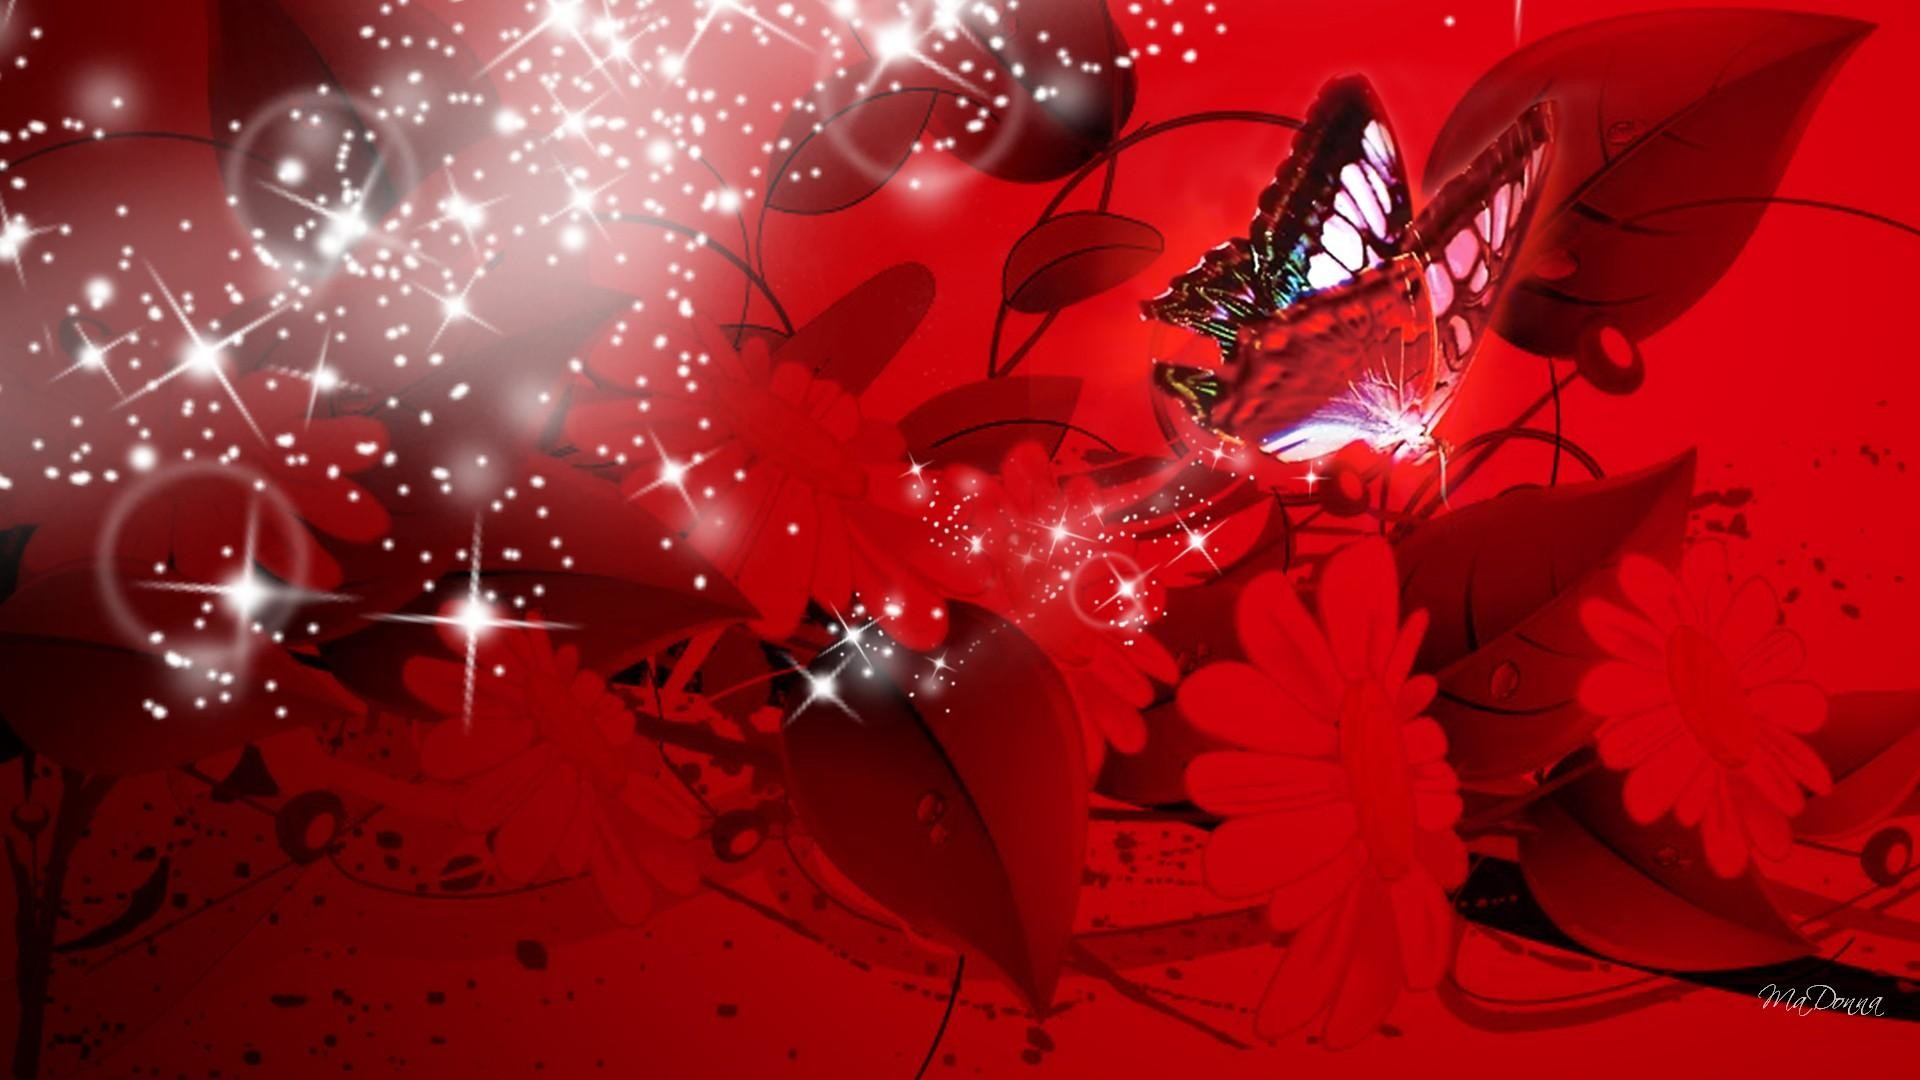 Red Butterfly Wallpaper - Red Butterfly Wallpaper Hd , HD Wallpaper & Backgrounds